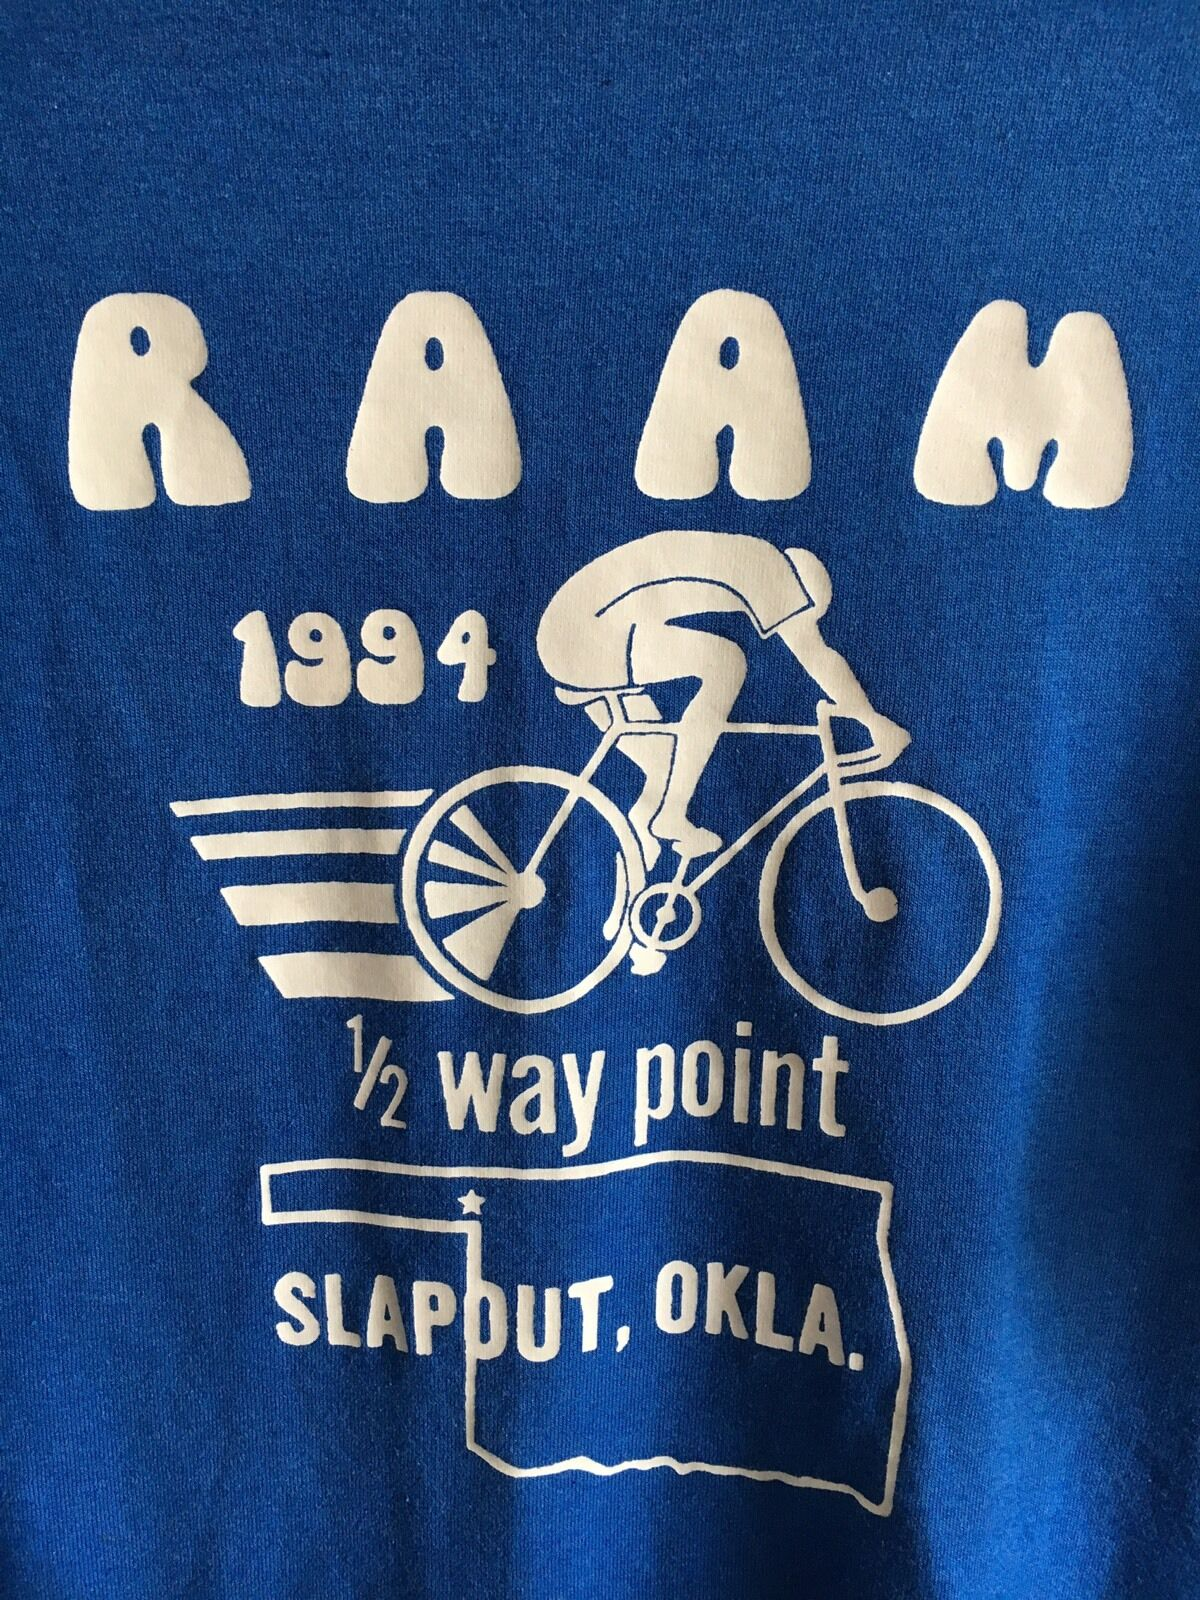 VTG RAAM 1994 Race Across America Bicycle/Bike Blau Slapout OK 1/2 Way T Shirt M